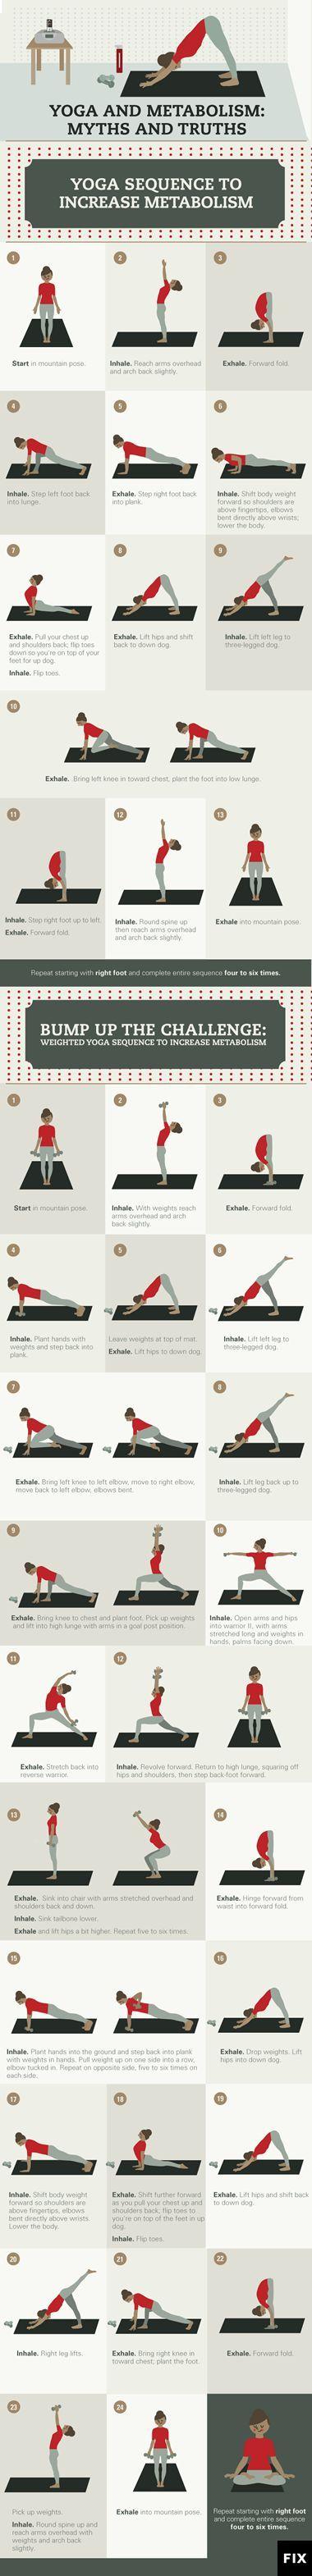 How Yoga Affects Metabolism